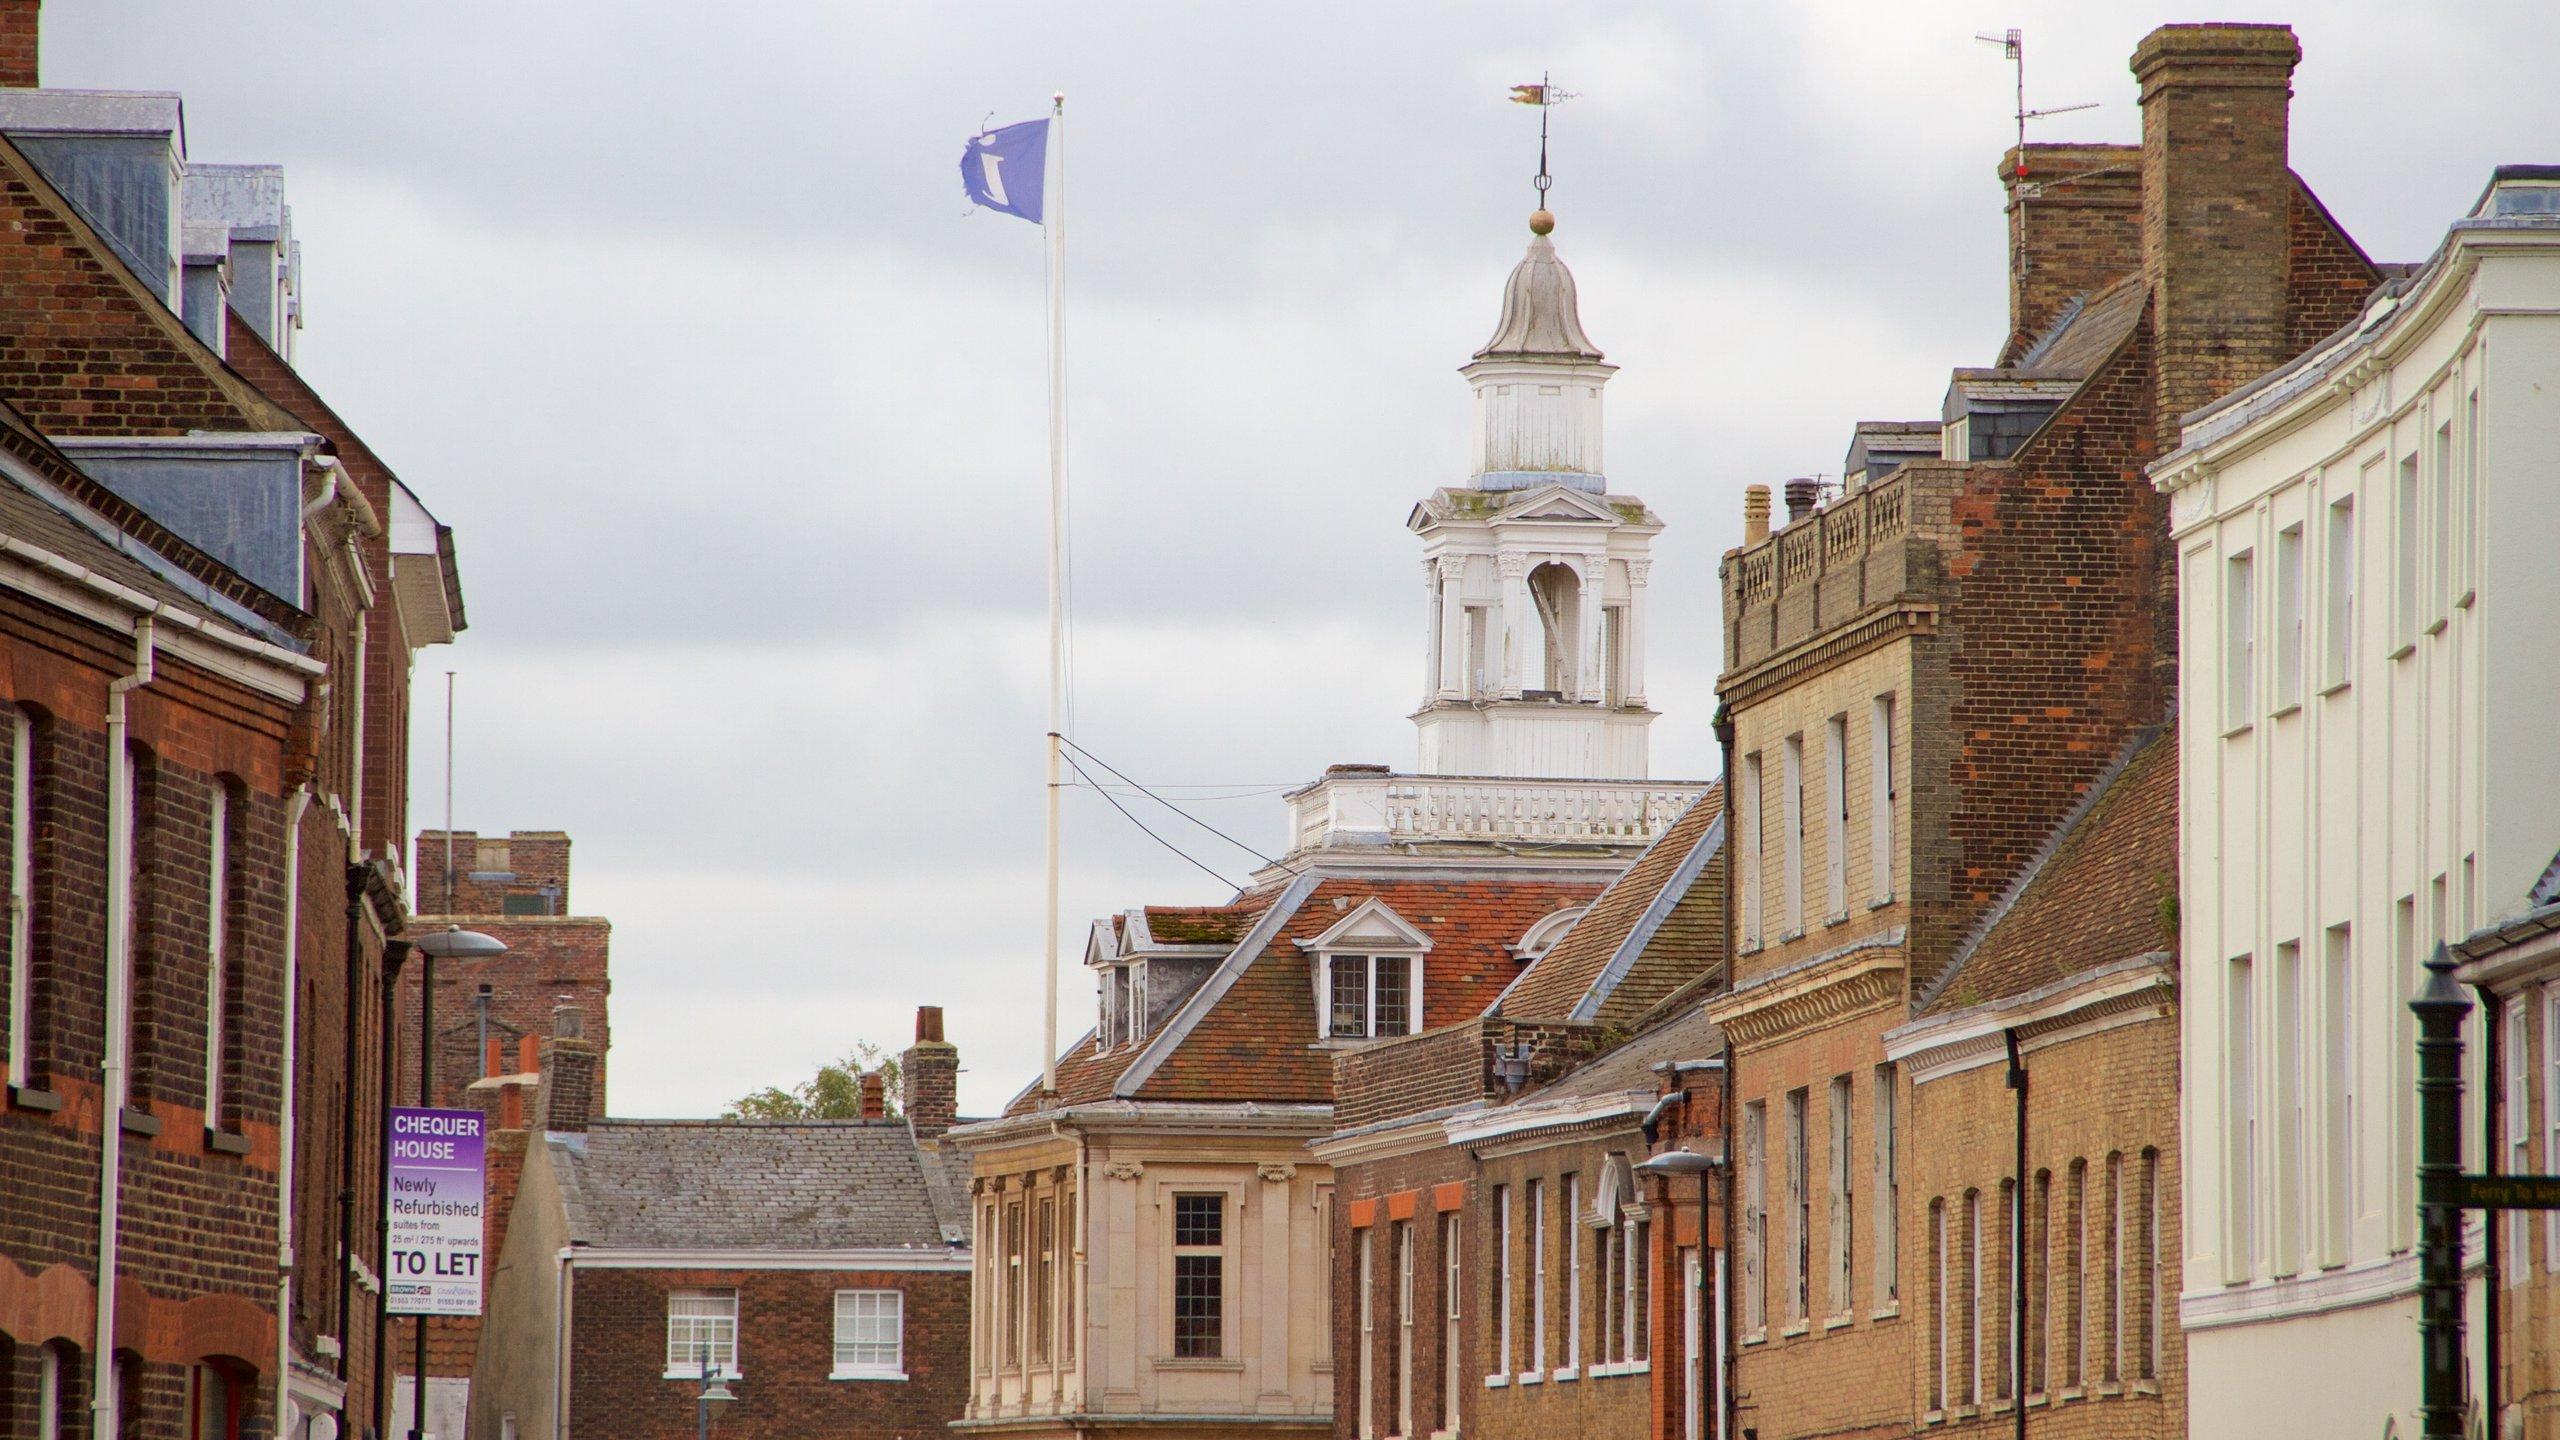 King's Lynn, England, United Kingdom